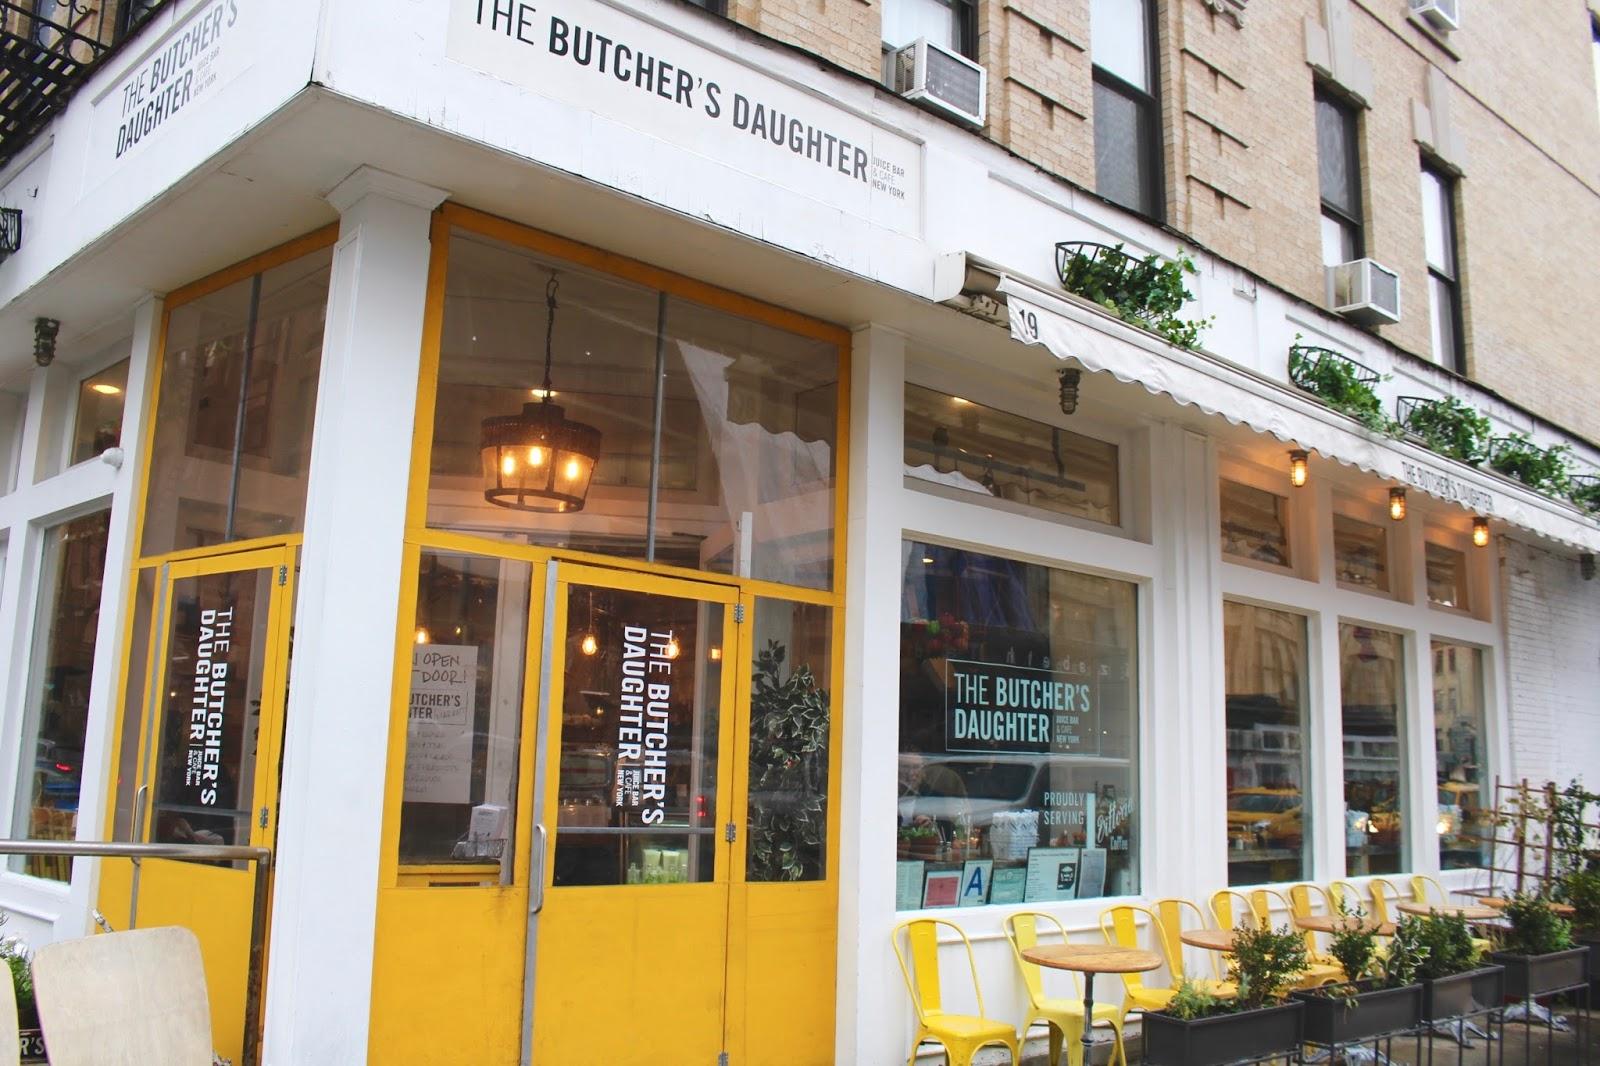 Butchers-Daughter-New-York-facade